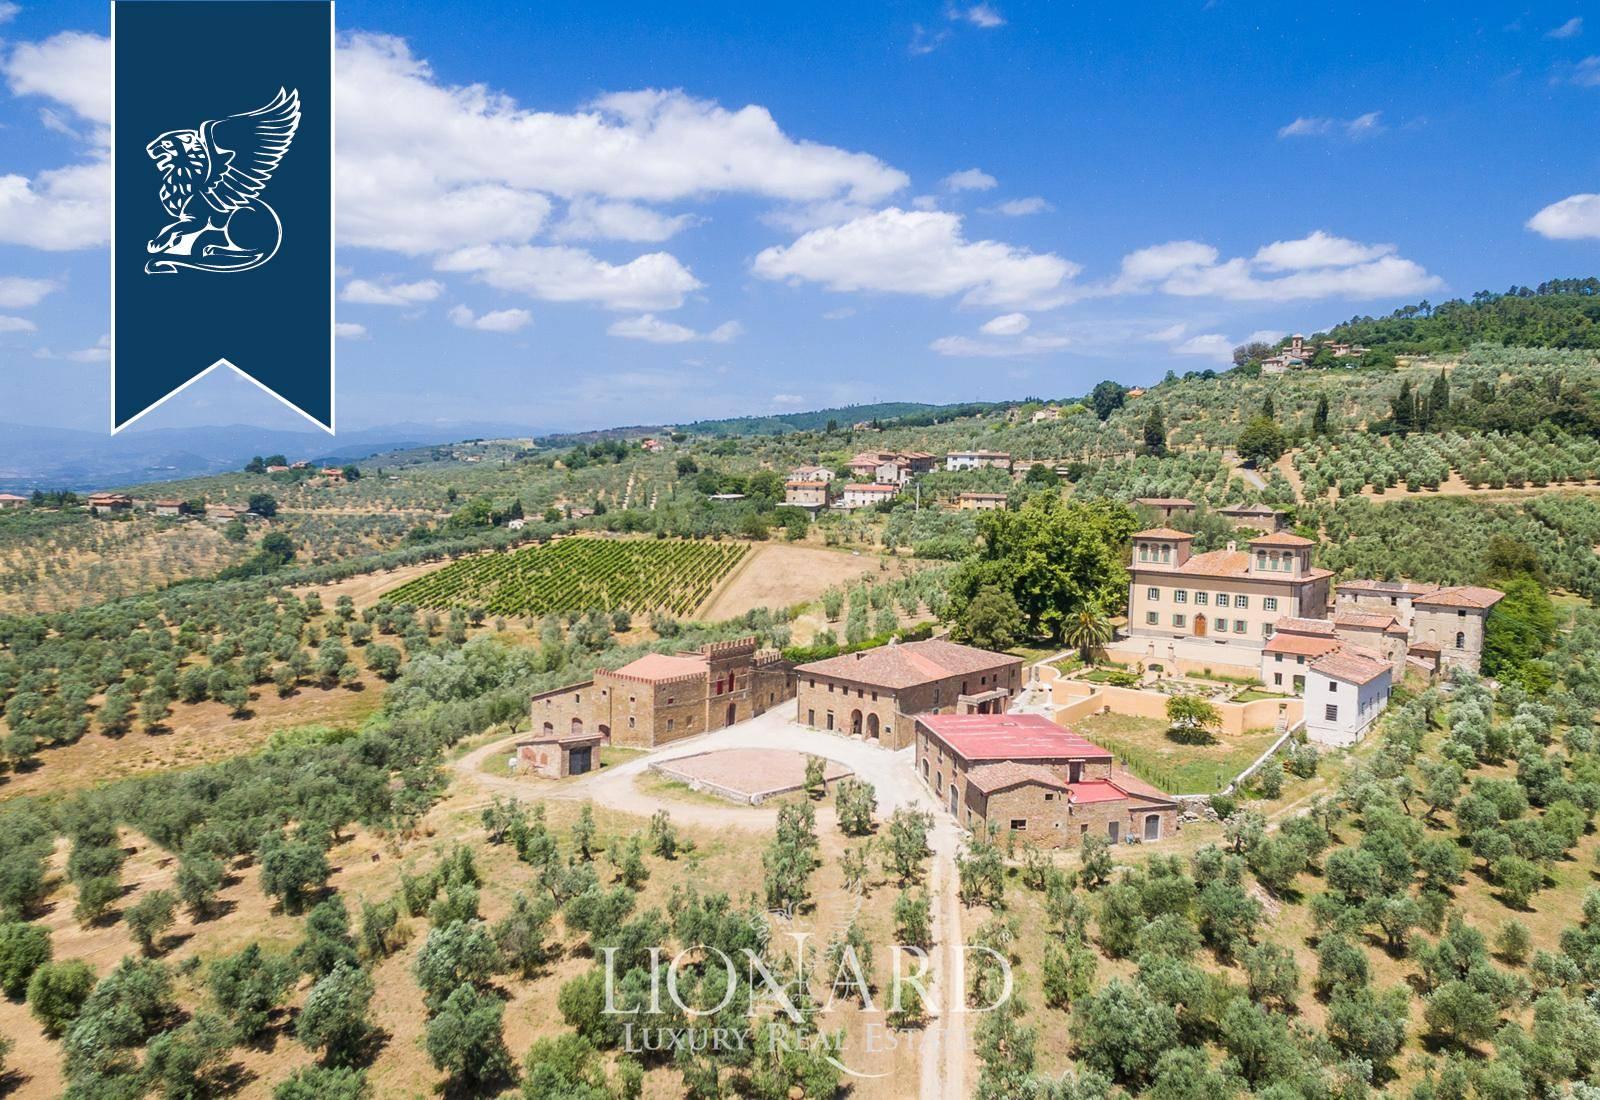 Villa in Vendita a Vinci: 0 locali, 5246 mq - Foto 6